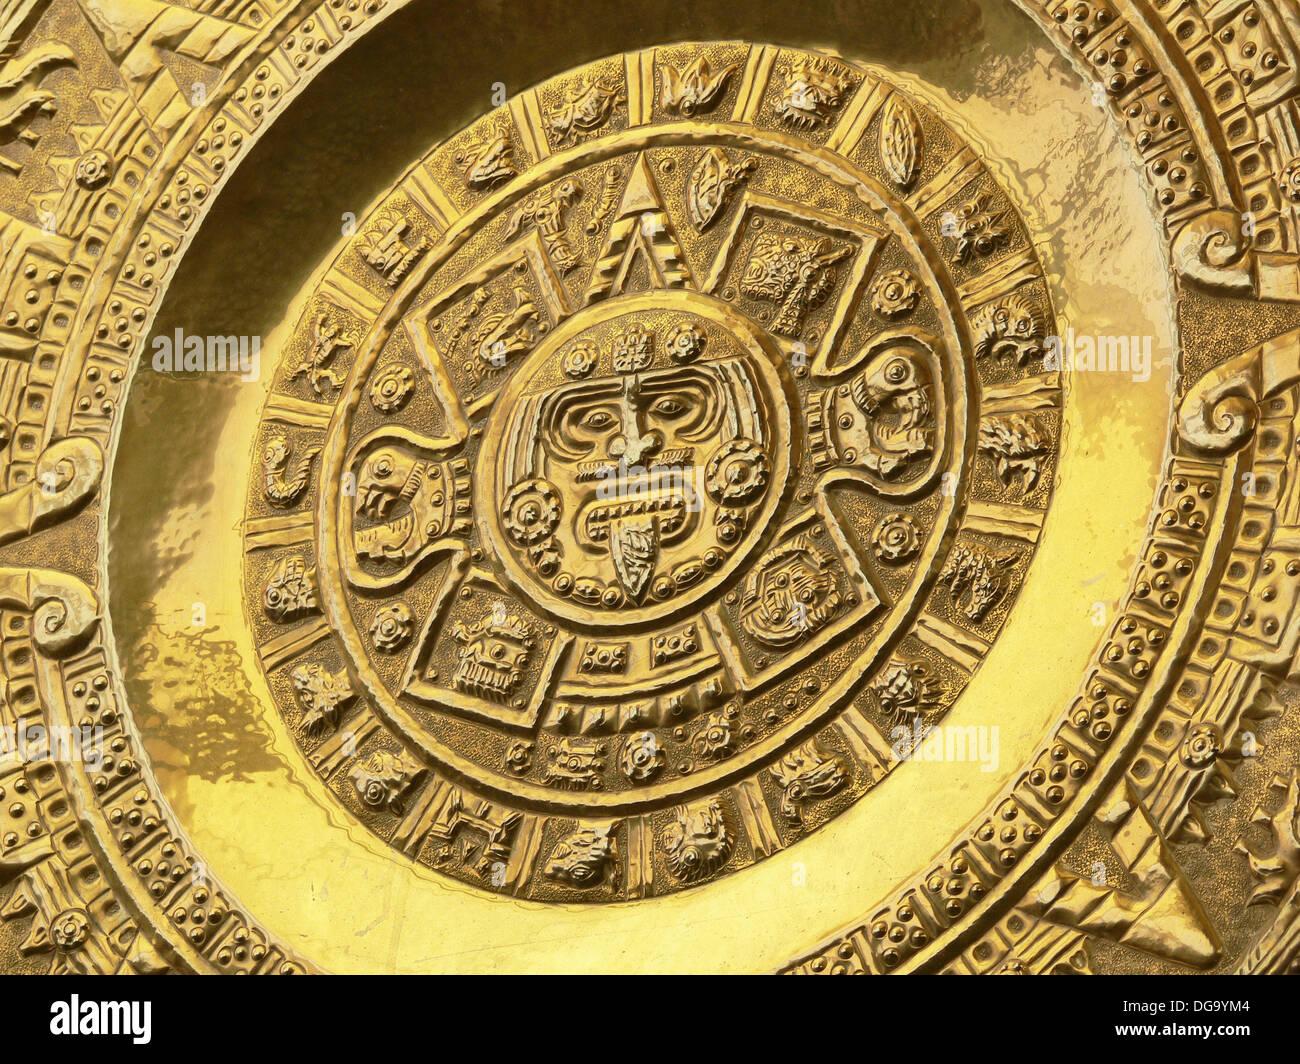 Aztec Market Stock Photos & Aztec Market Stock Images - Alamy